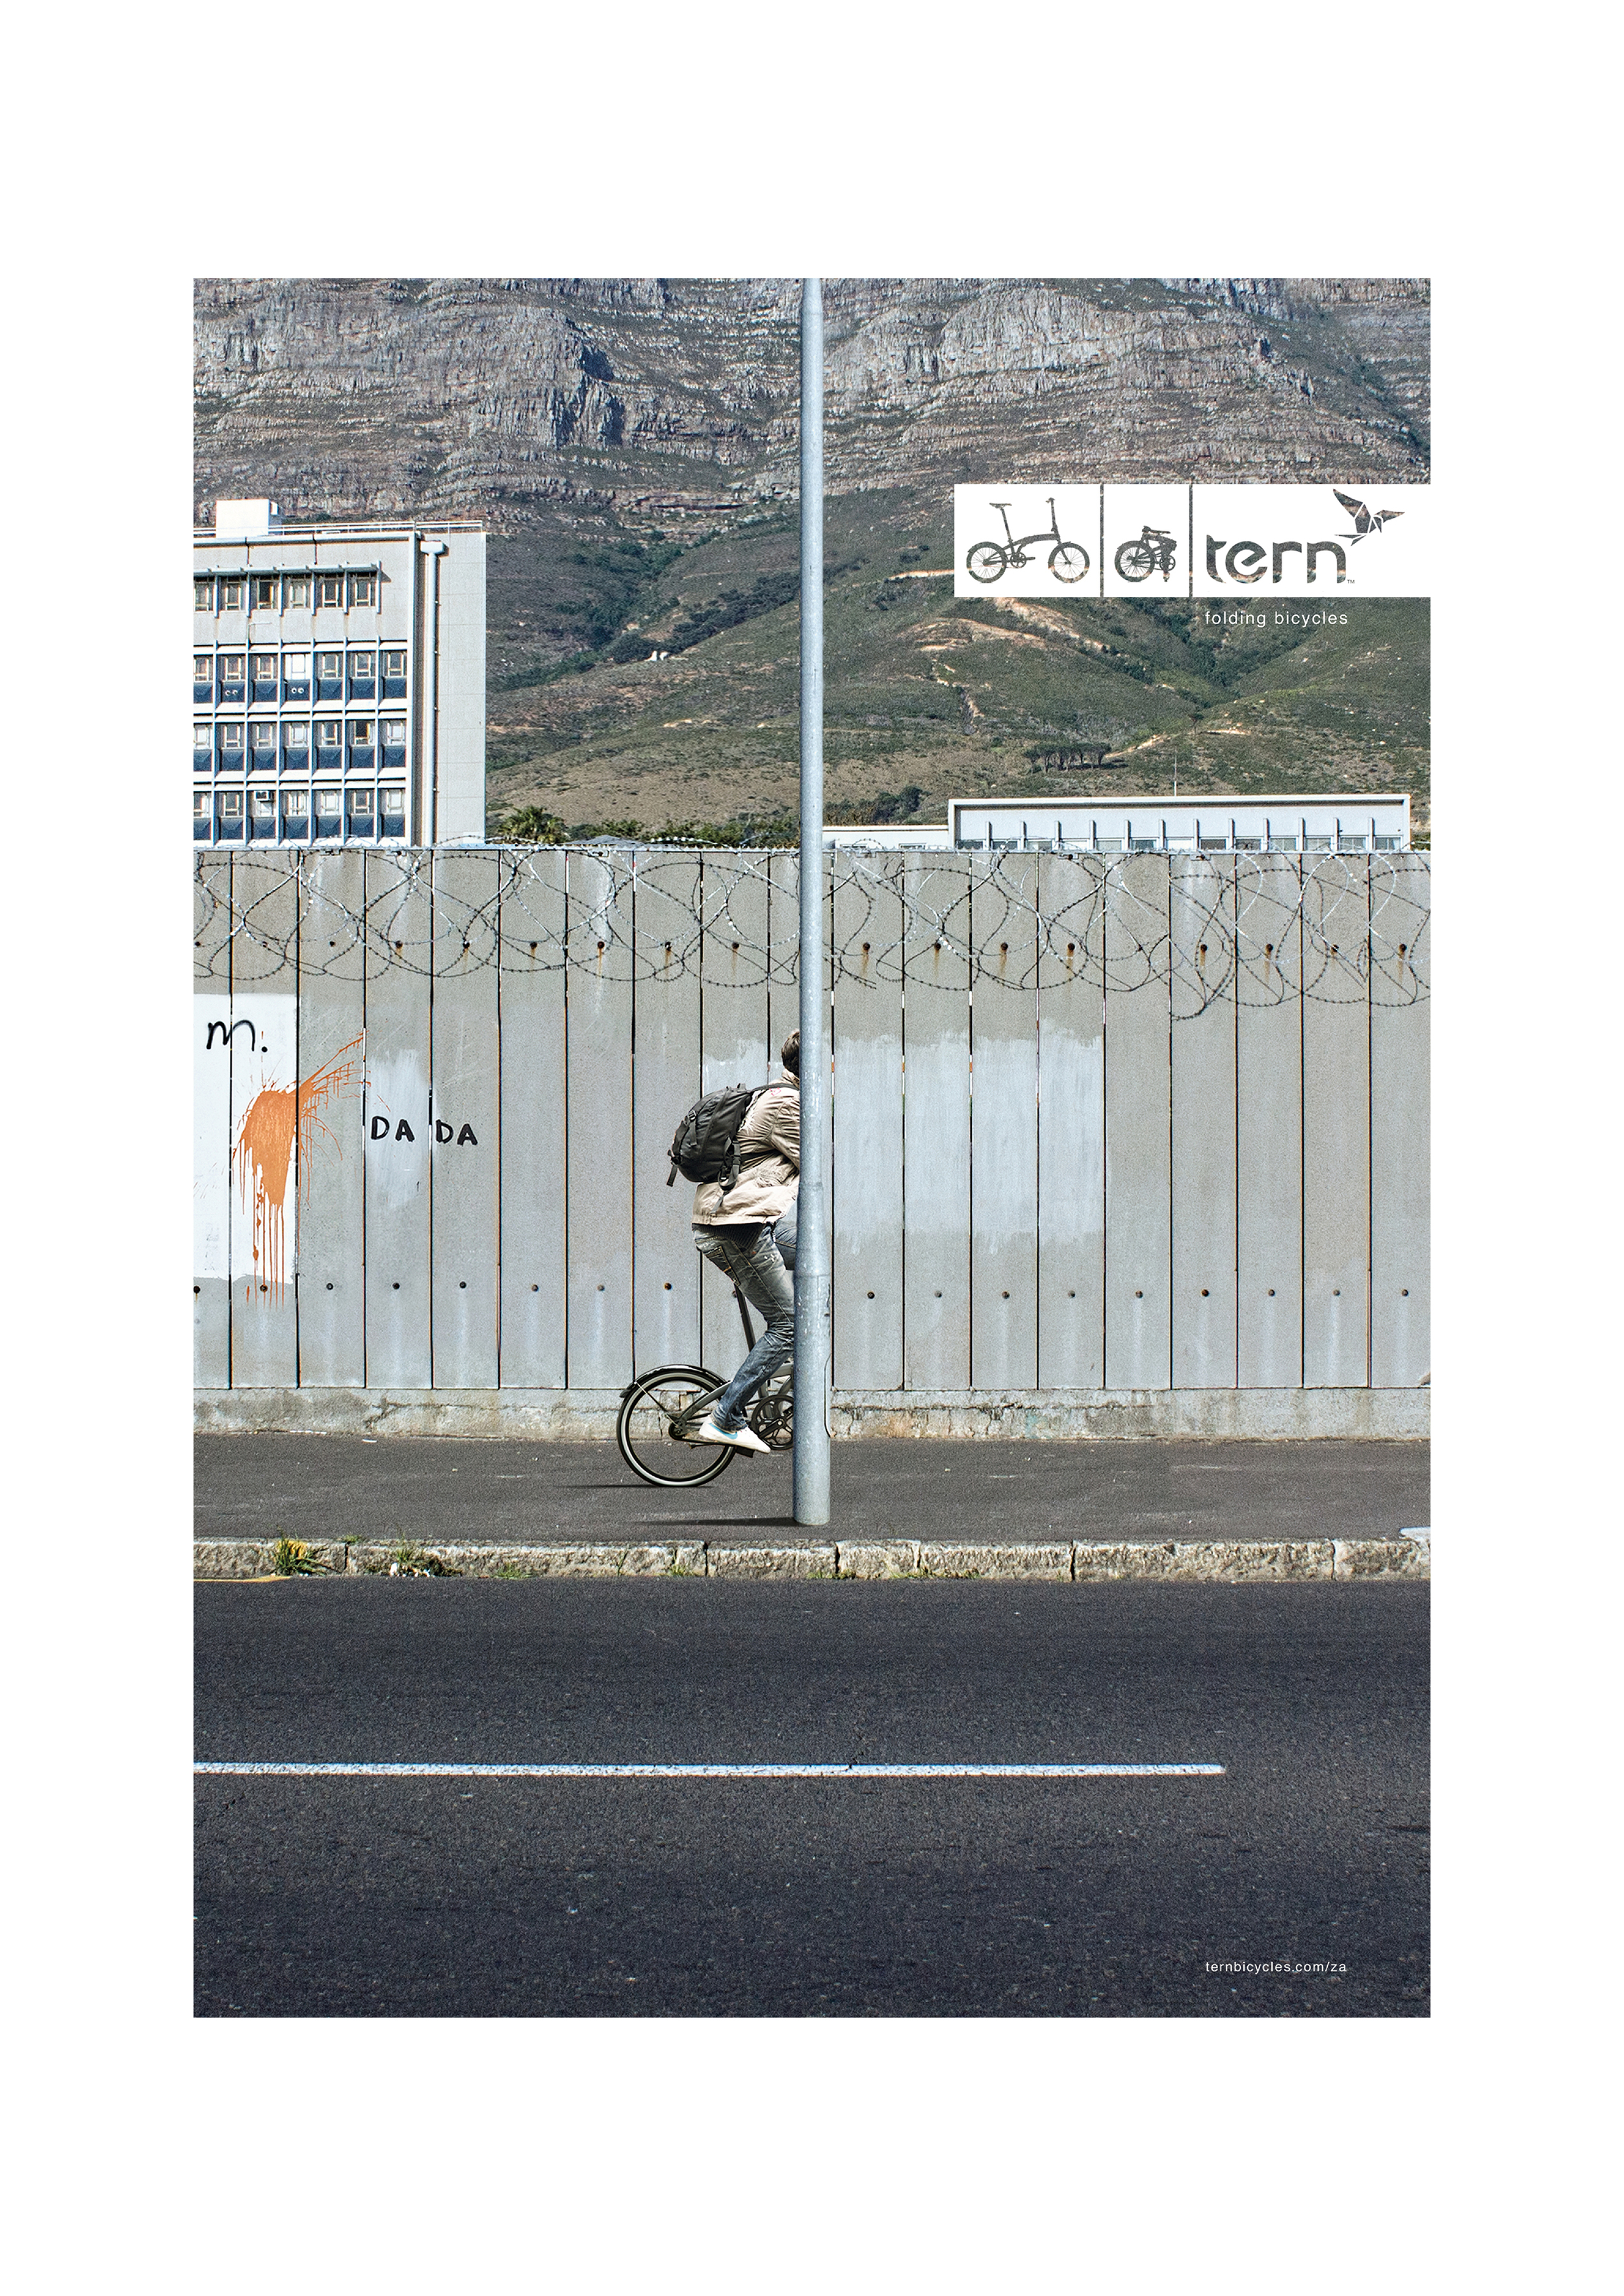 140BBDOLoeries_Tern - Folding Bikes Posters_FA2.jpg